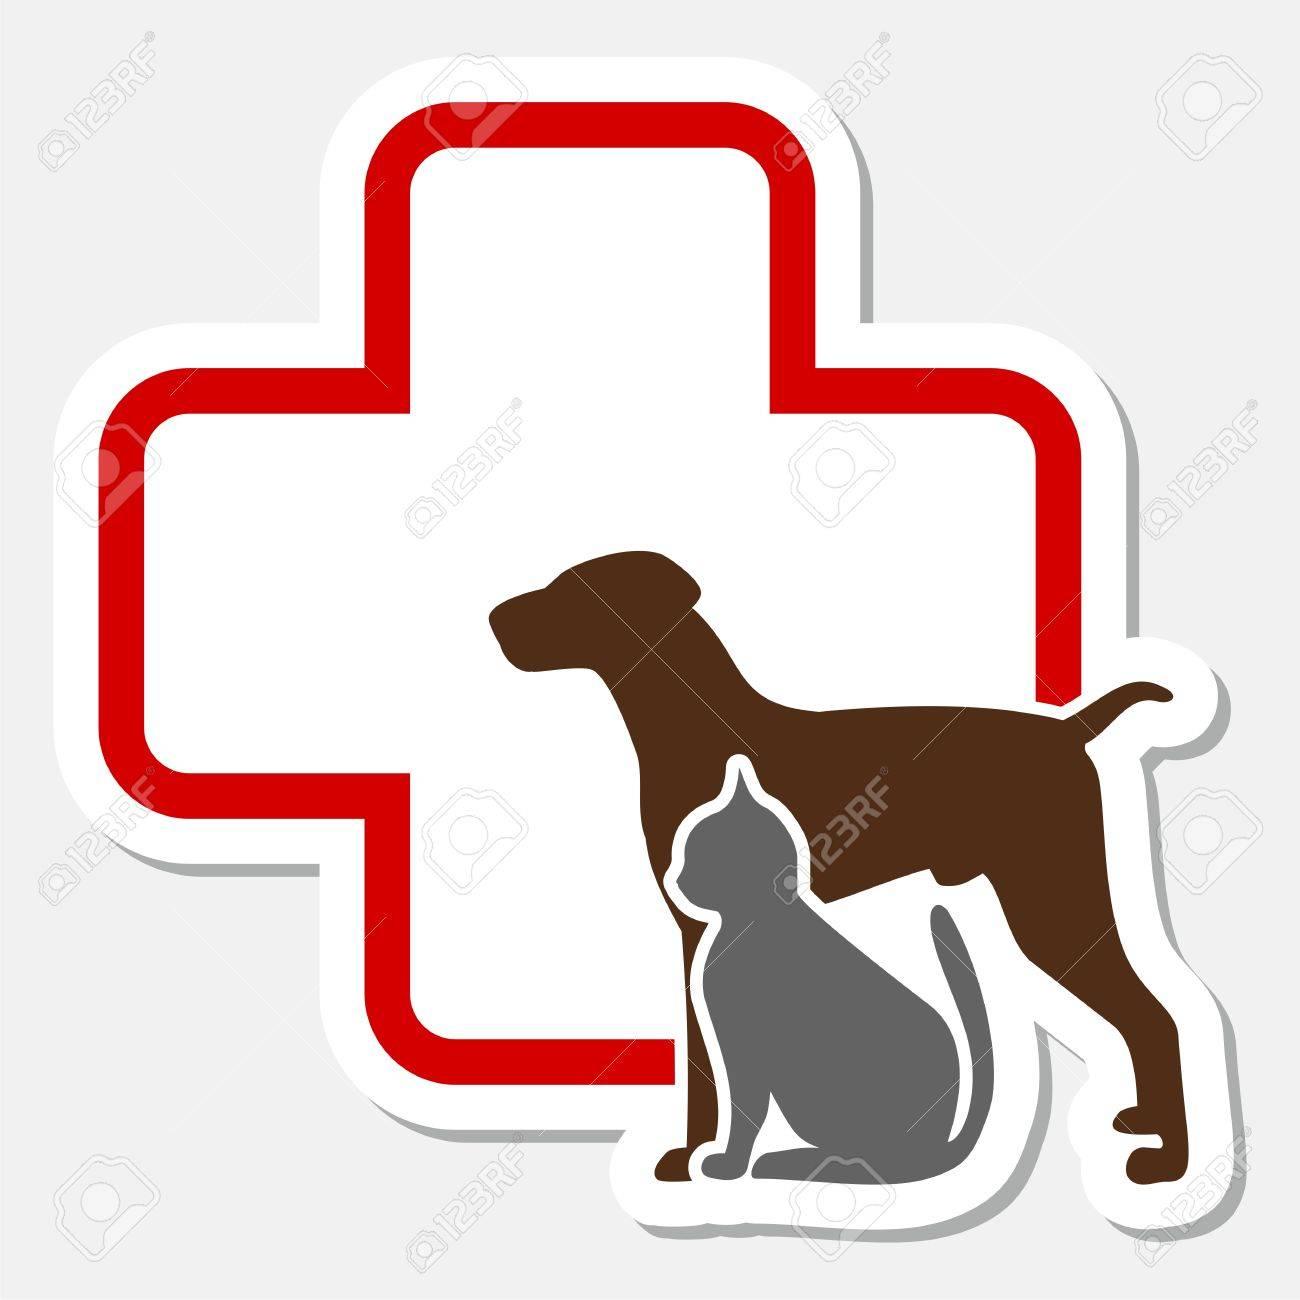 Veterinary icon with medicine symbol - 52795767